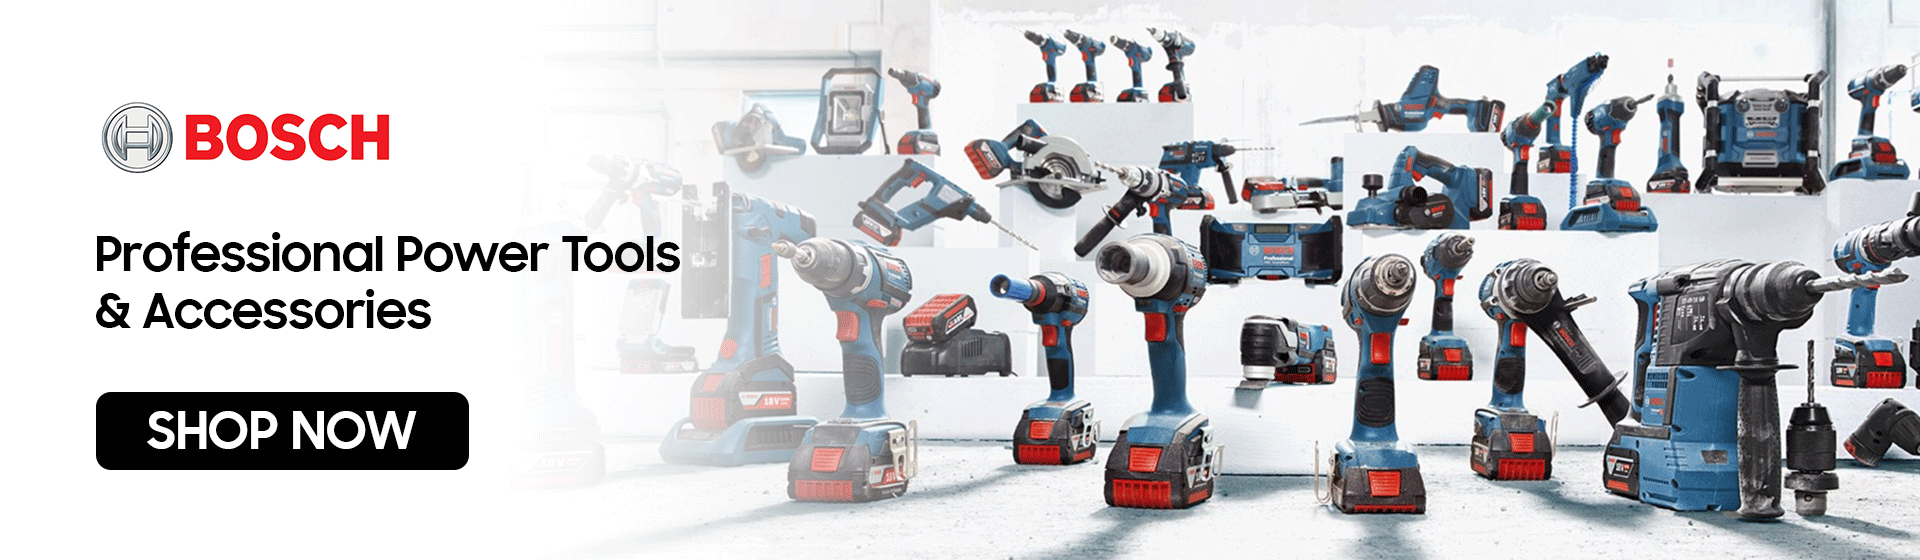 Bosch Professional Tools